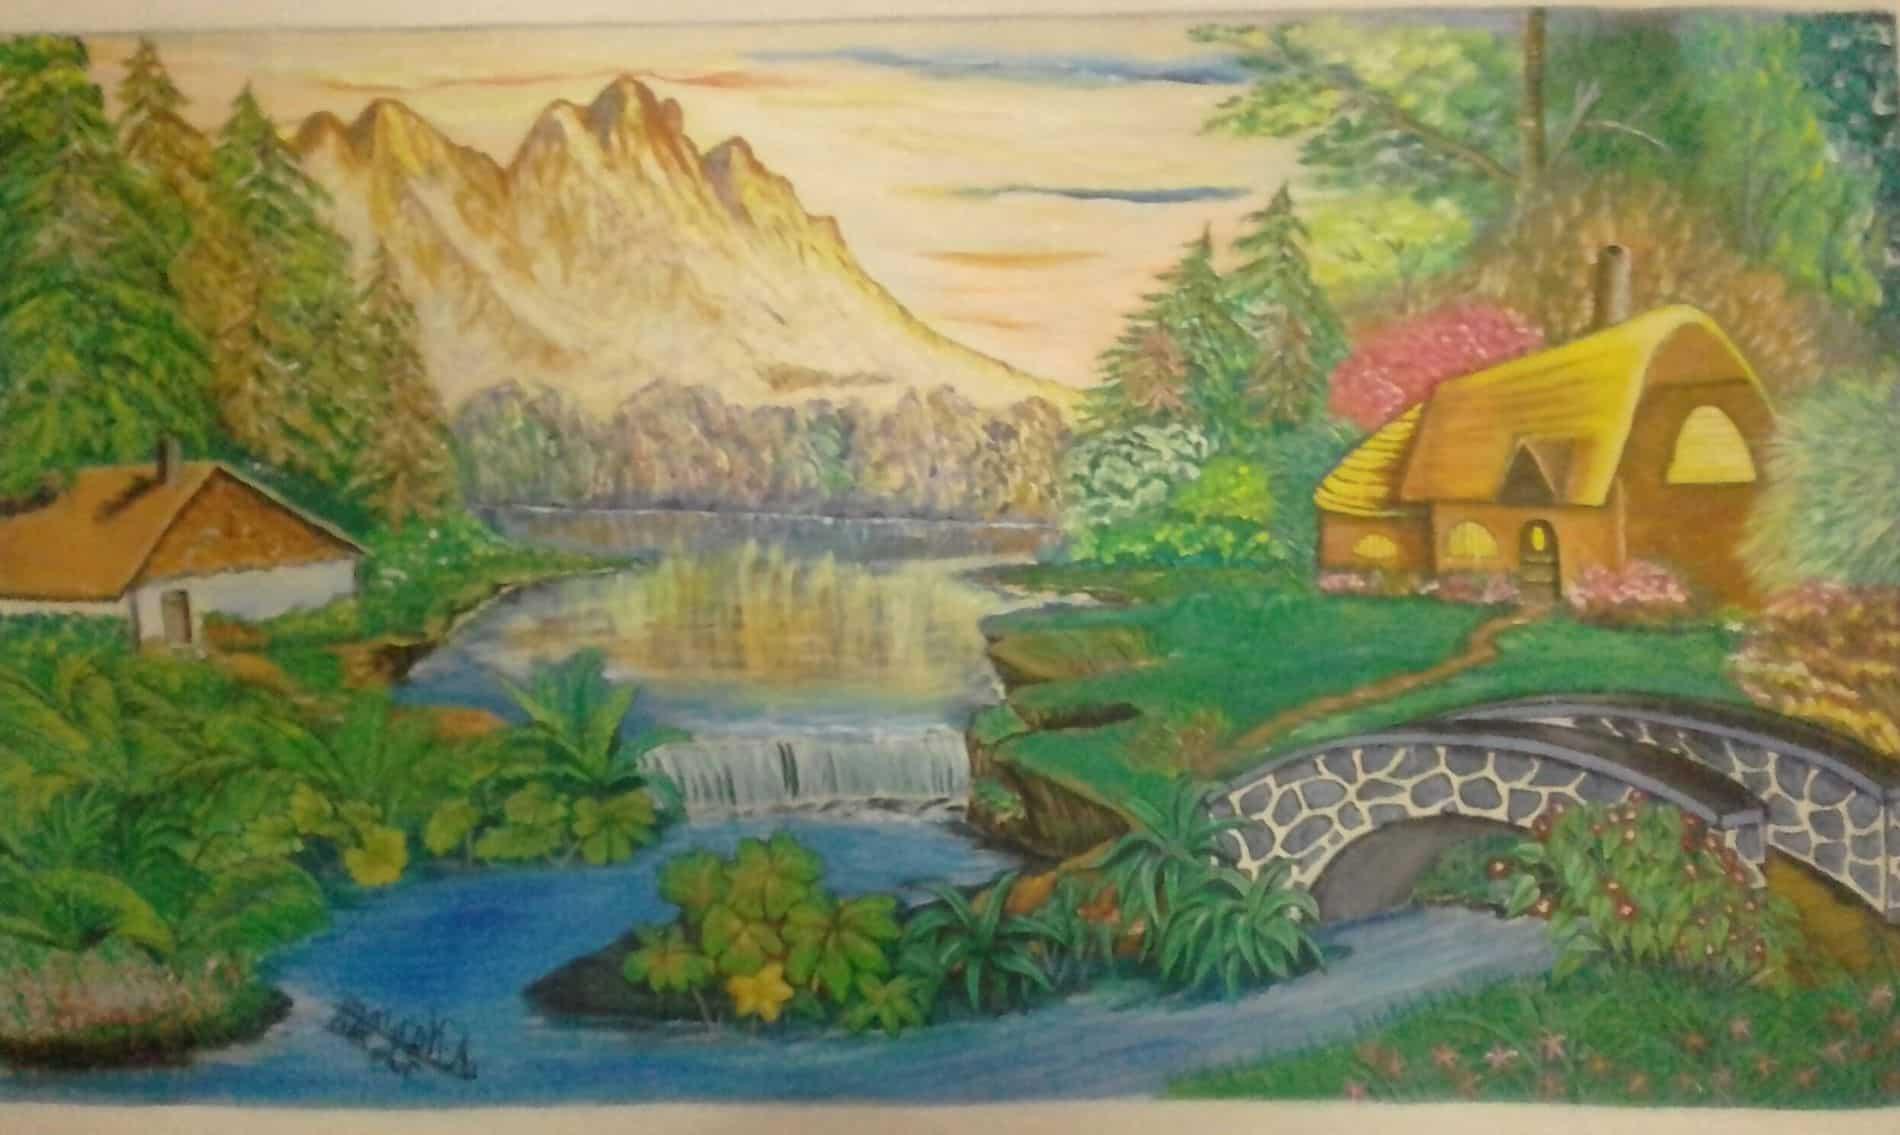 Mauritius Arts & Artists - mauritius-arts-asha-nawoor-mountain-view